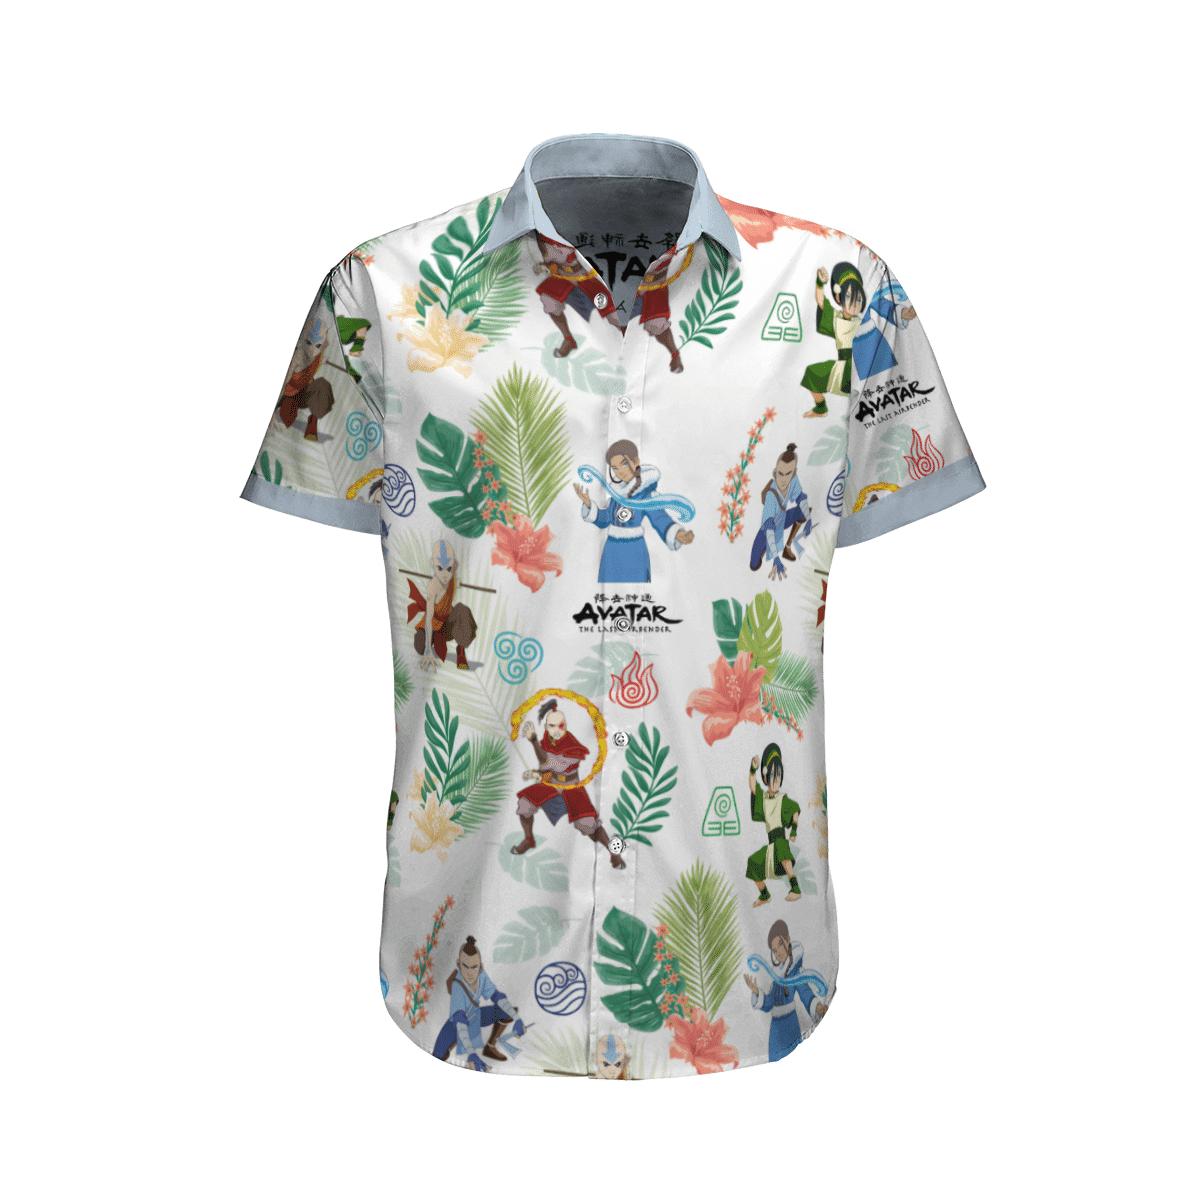 Earth Kingdom Avatar Hawaiian shirt - LIMITED EDITION